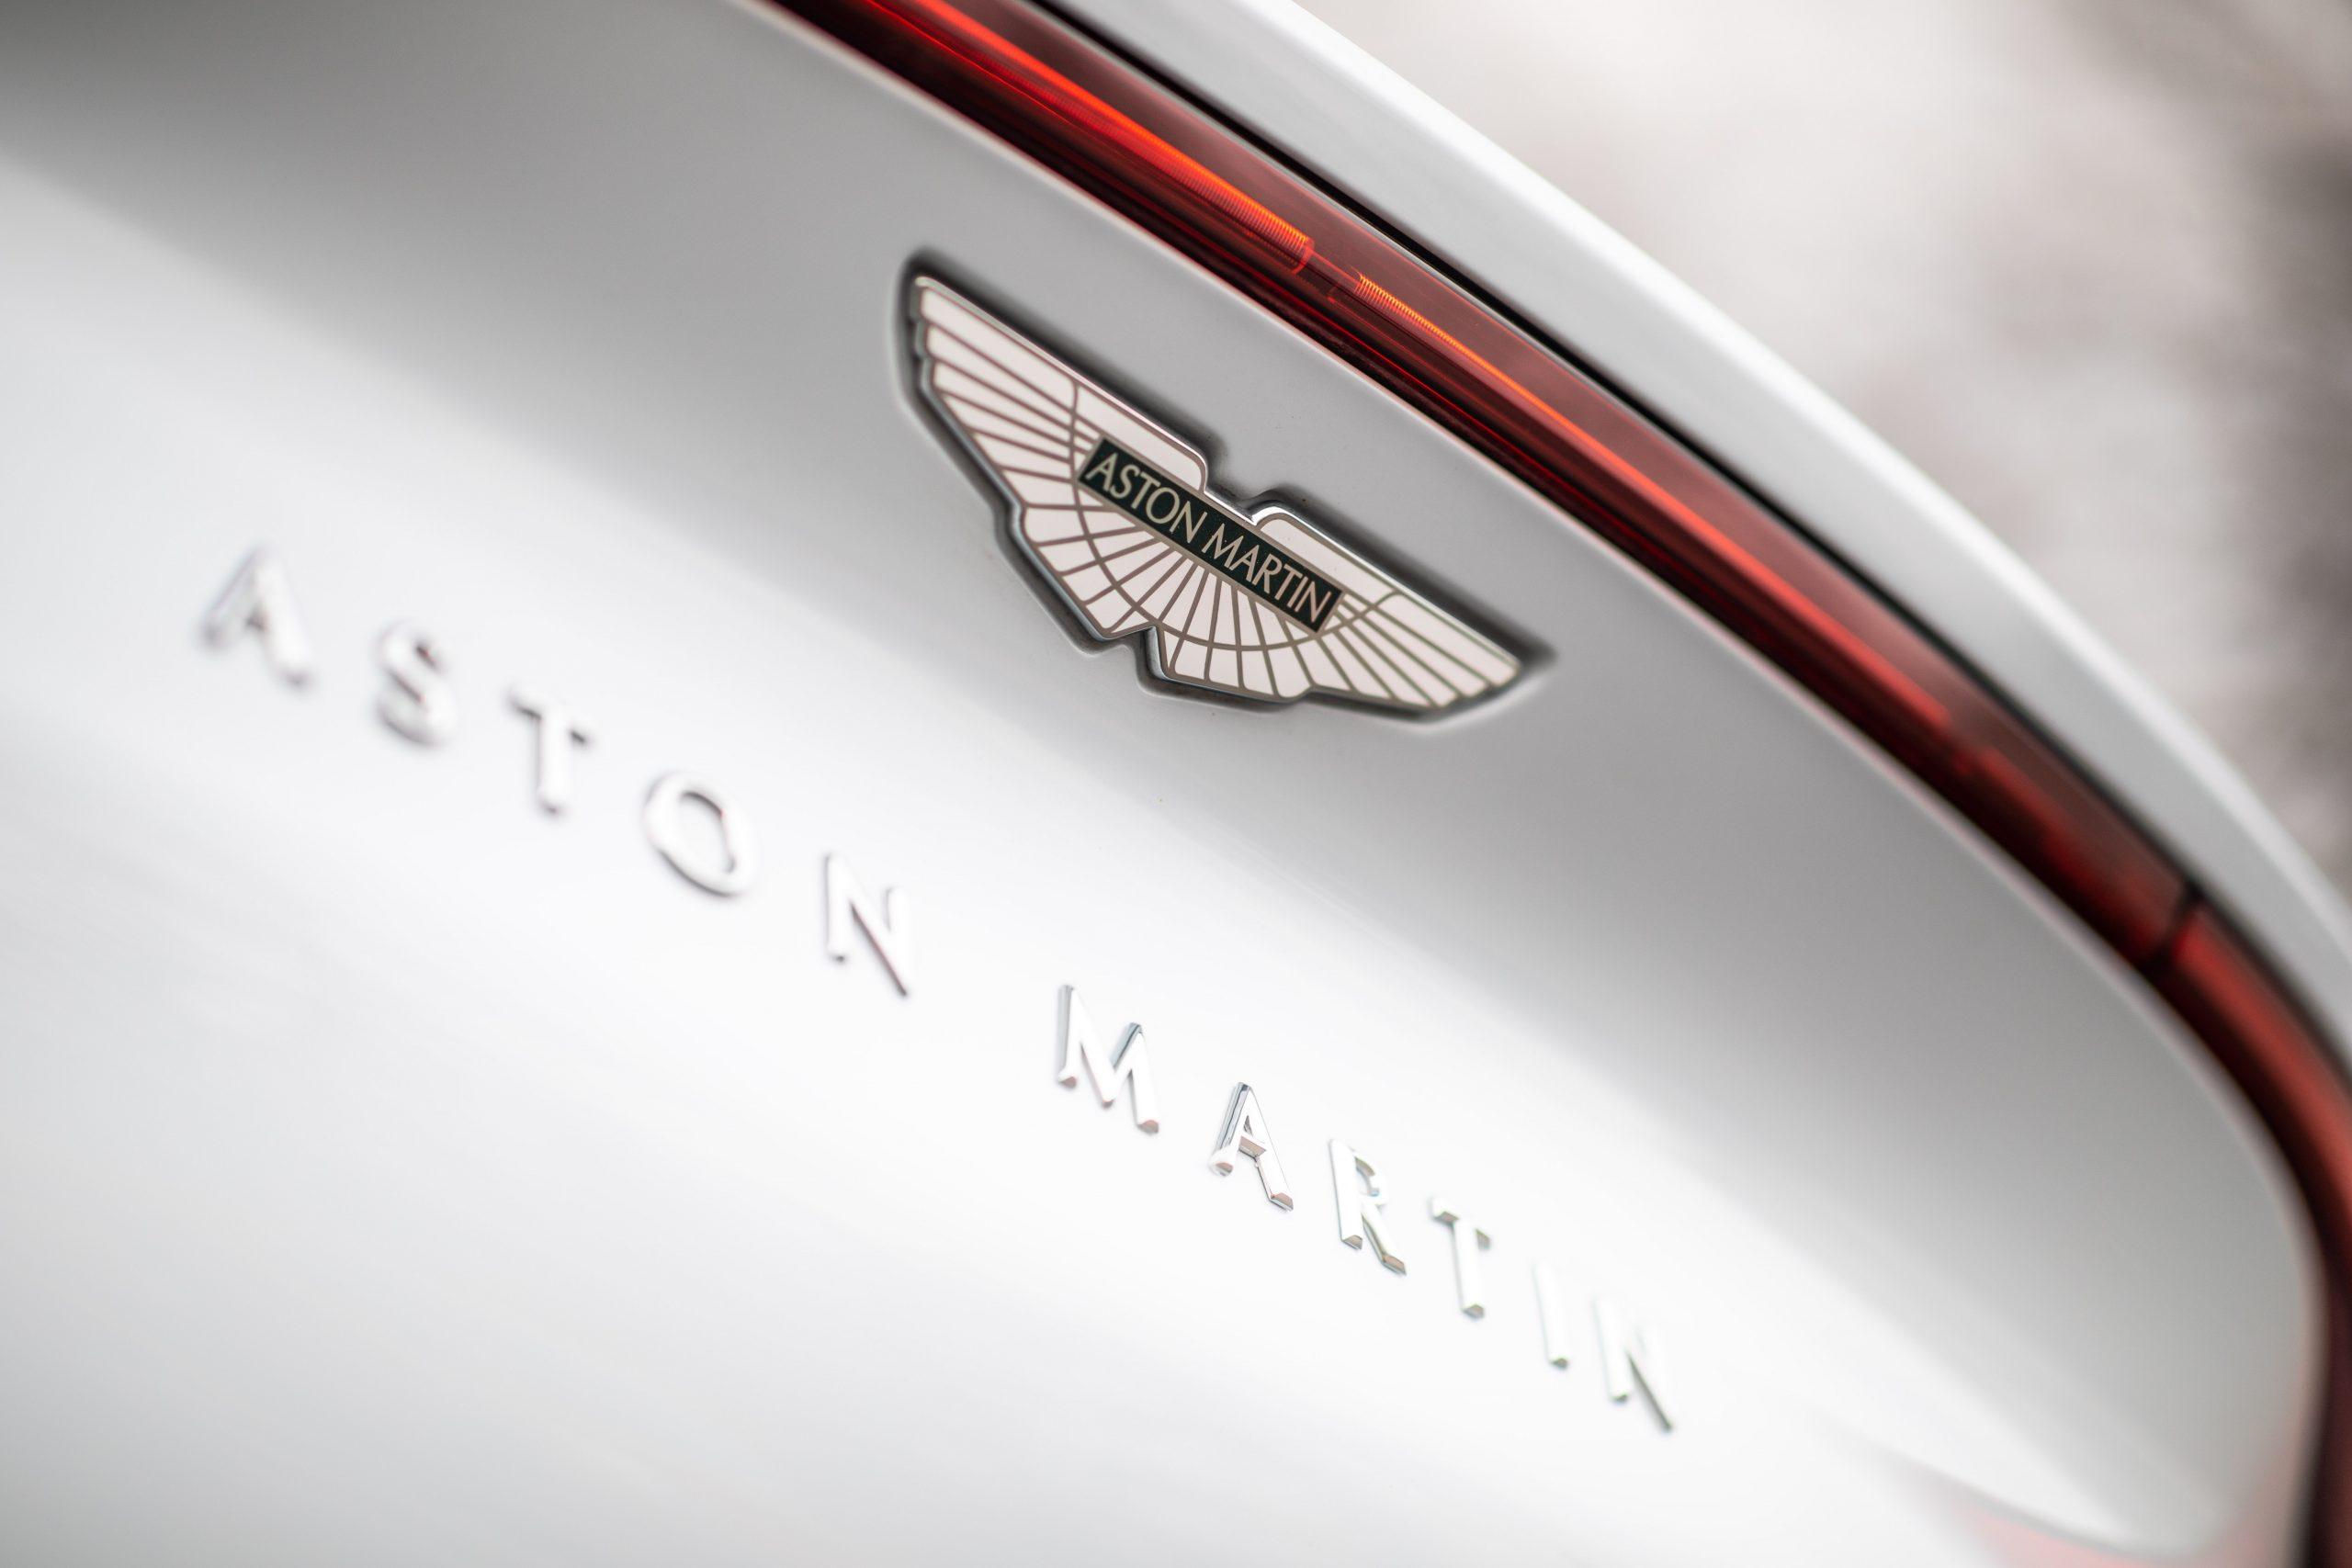 2021 Aston Martin DBX rear trunk badge lettering